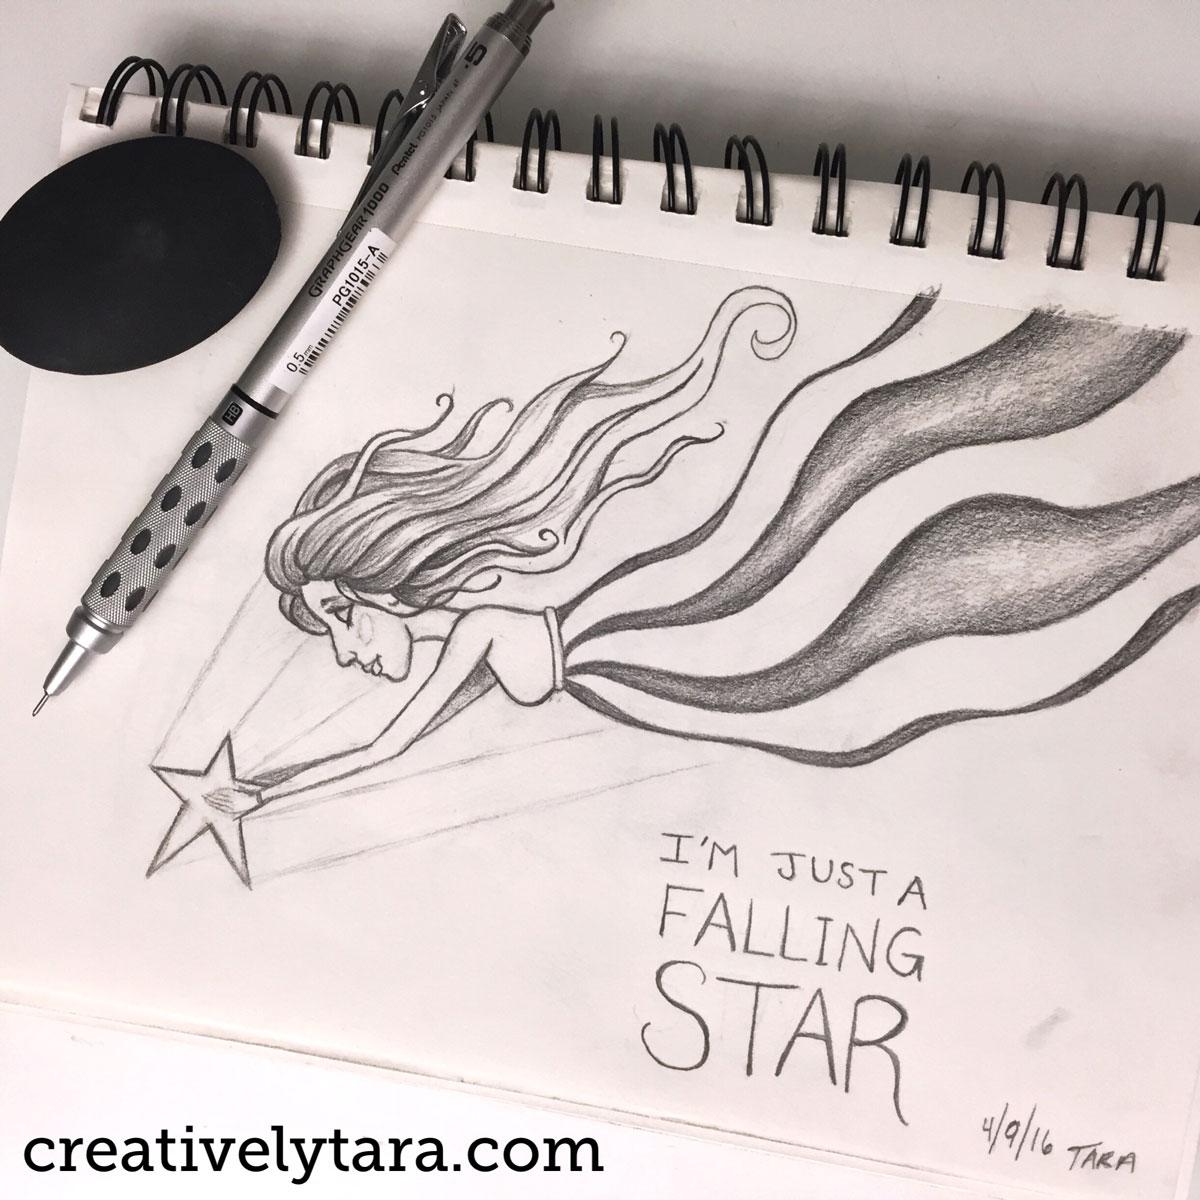 CreativelyTara_April16_Sketch1.jpg